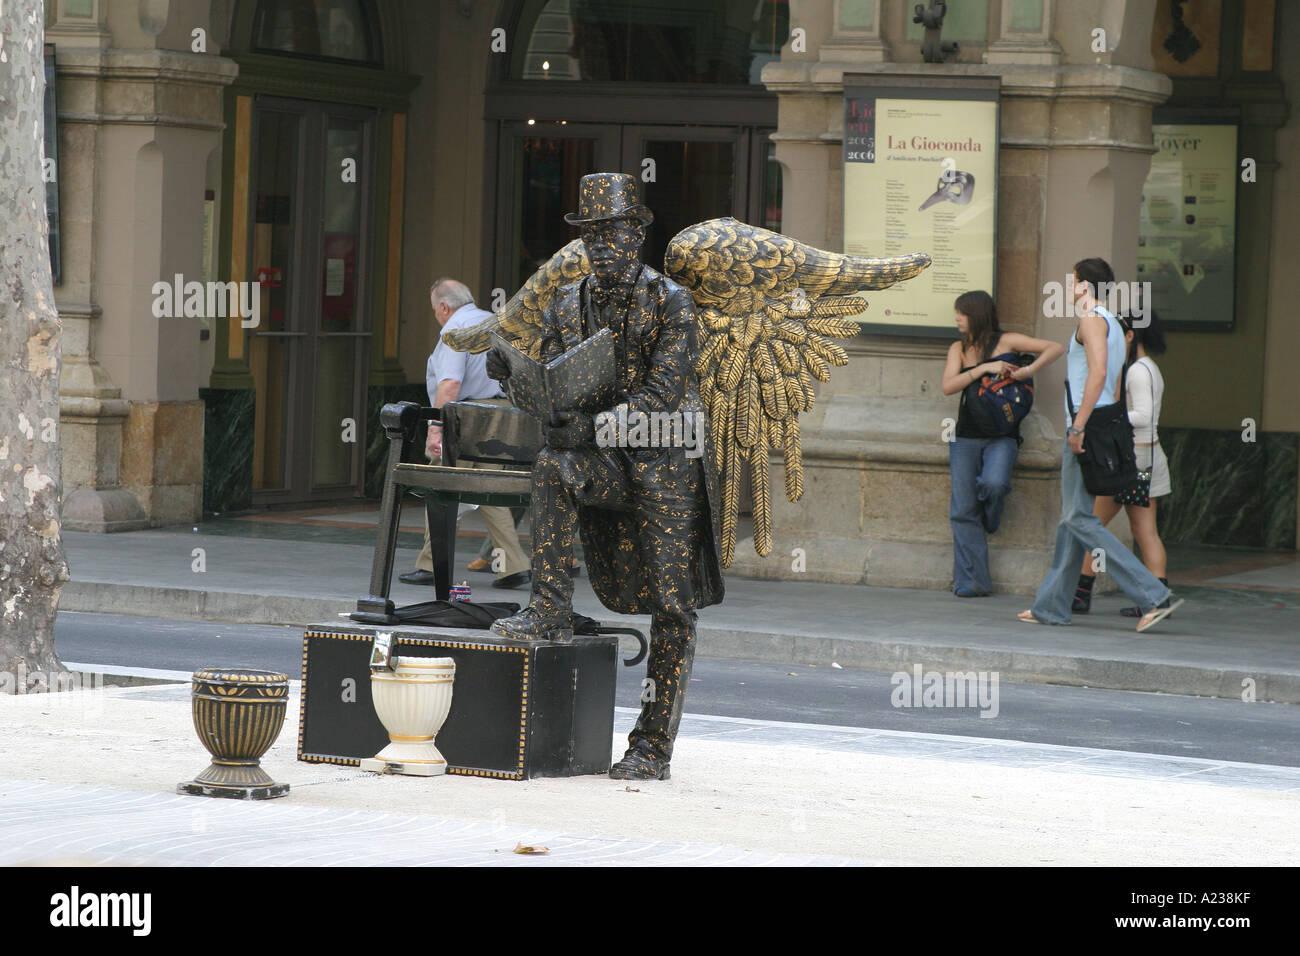 Street artiste in Barcelona - Stock Image